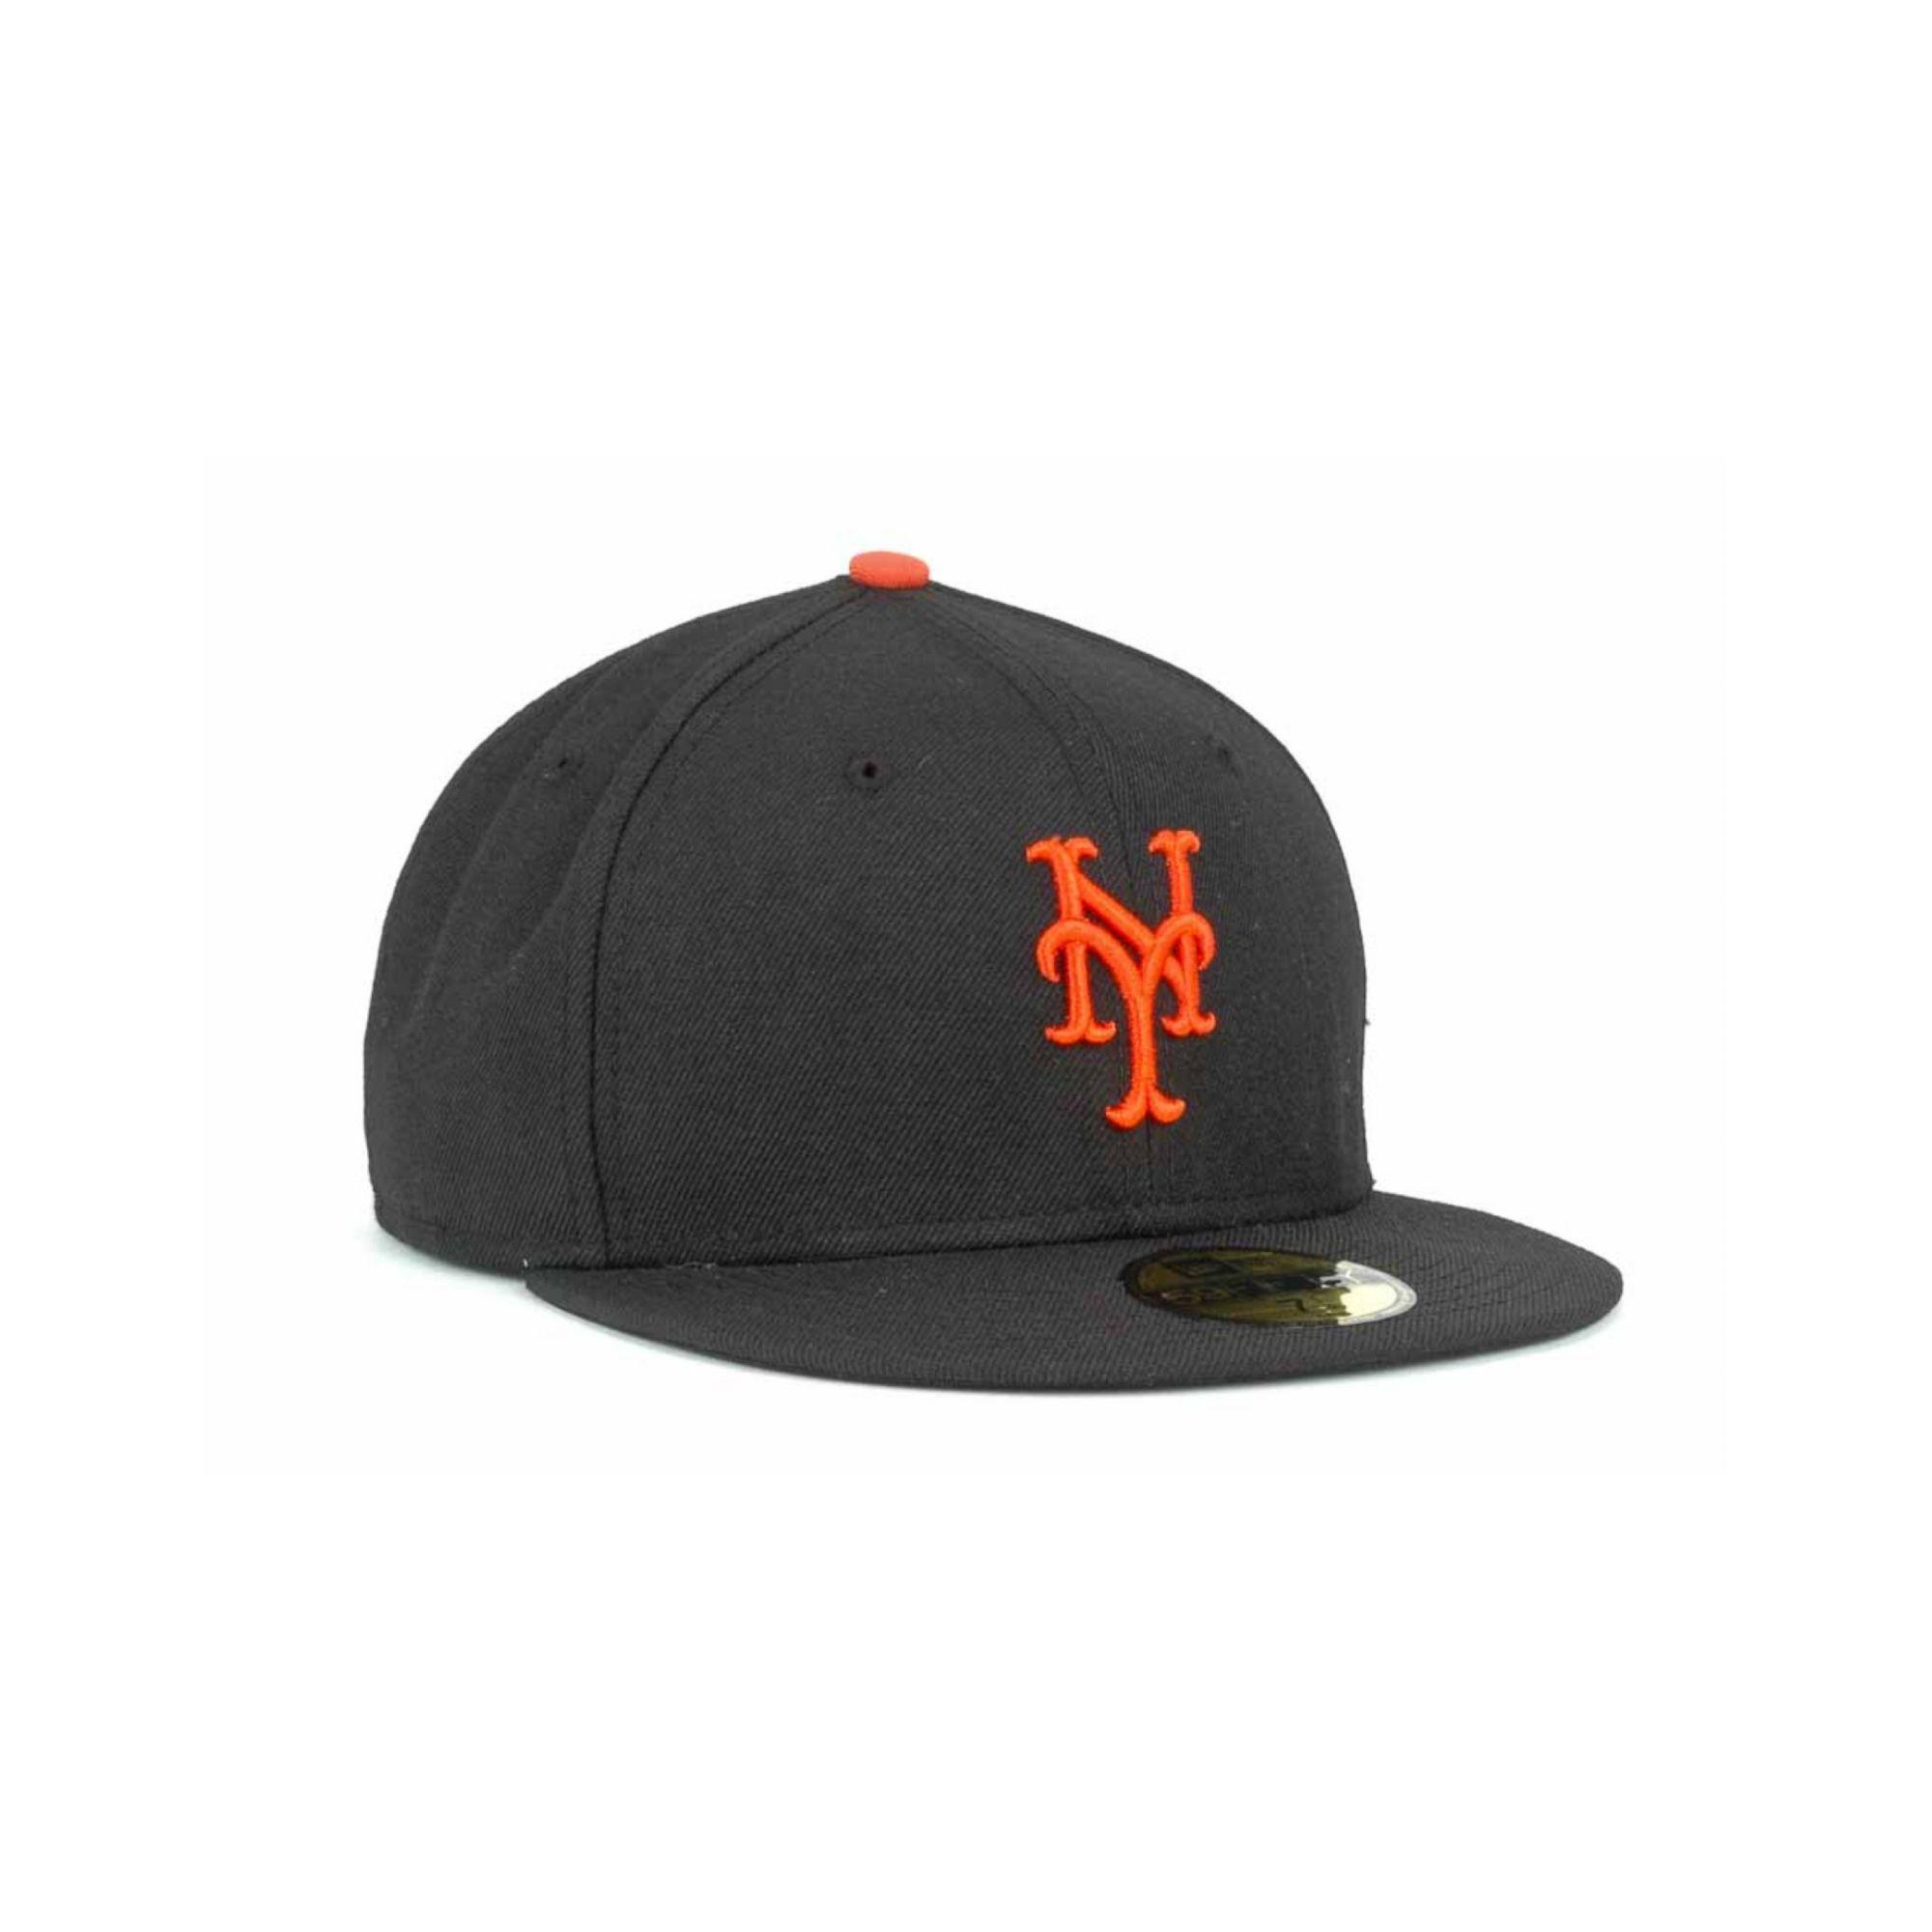 54c891aac5b Lyst - Ktz New York Giants Mlb Cooperstown 59fifty Cap in Black for Men